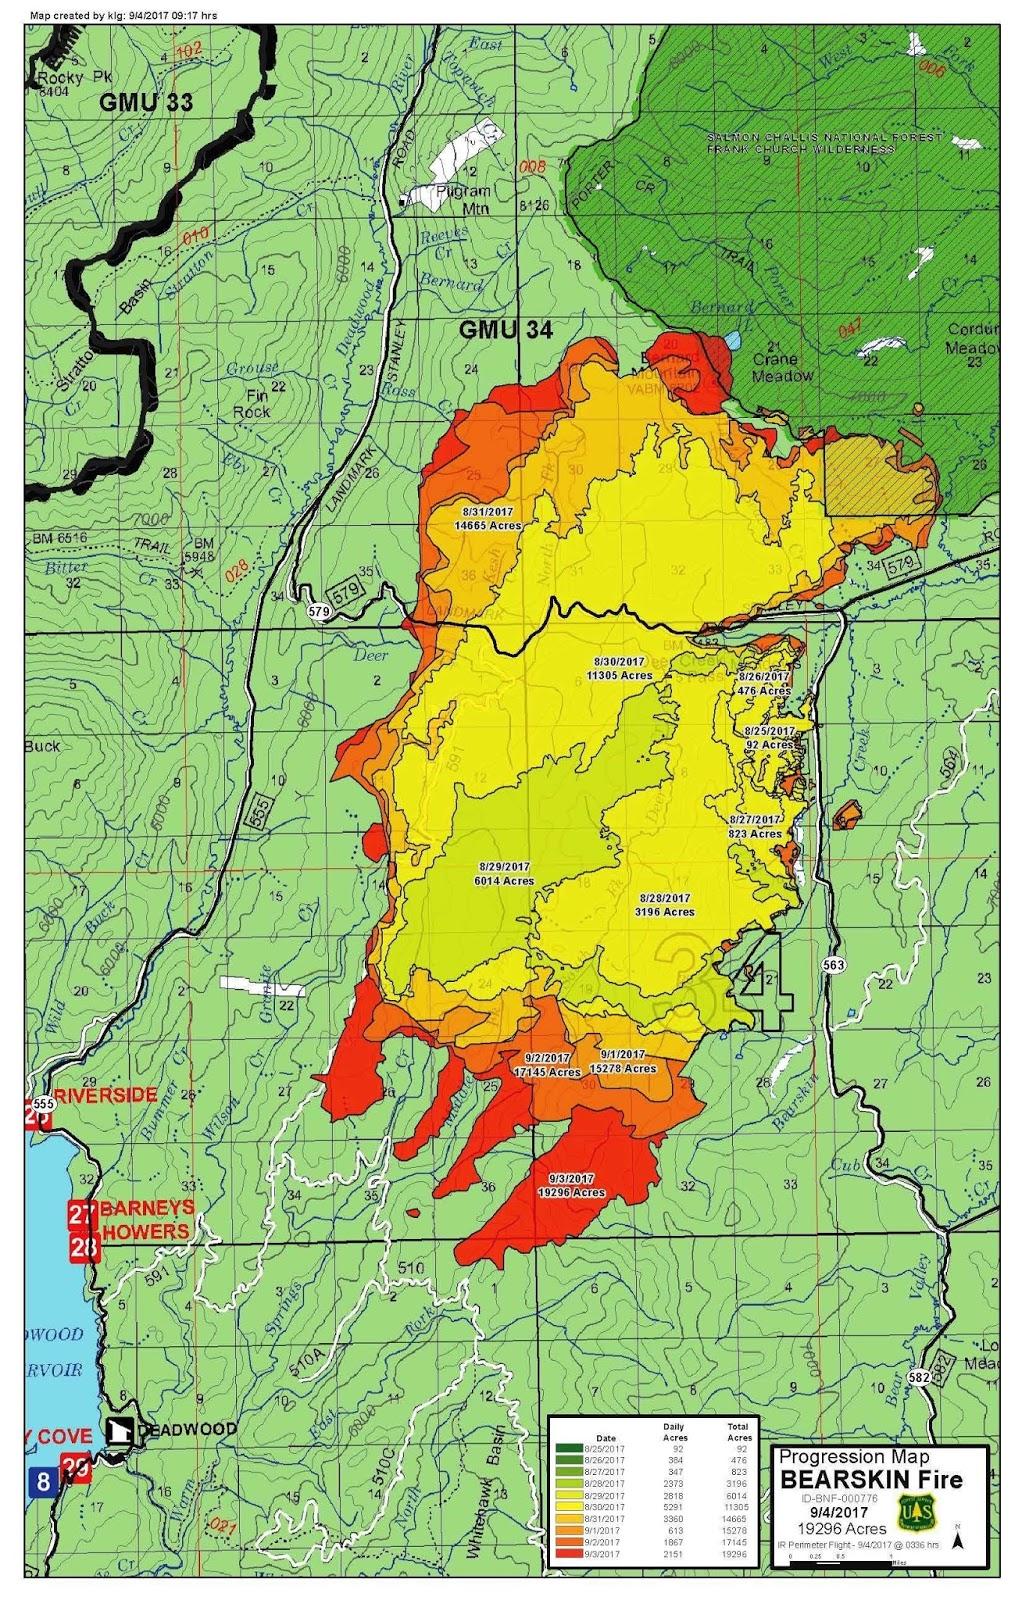 Idaho Fire Information: Bearskin Fire Update –Tuesday ... on northern idaho map, montana state map, idaho river map, wa state map, idaho topo map, idaho pipeline map, preston idaho map, idaho hospital map, interstate 422 map, idaho travel map, idaho drive map, idaho fire map, idaho map with cities, idaho desert map, idaho snow map, boise idaho map, oregon washington idaho map, idaho landscape map, hokkaido travel map, idaho rd map,